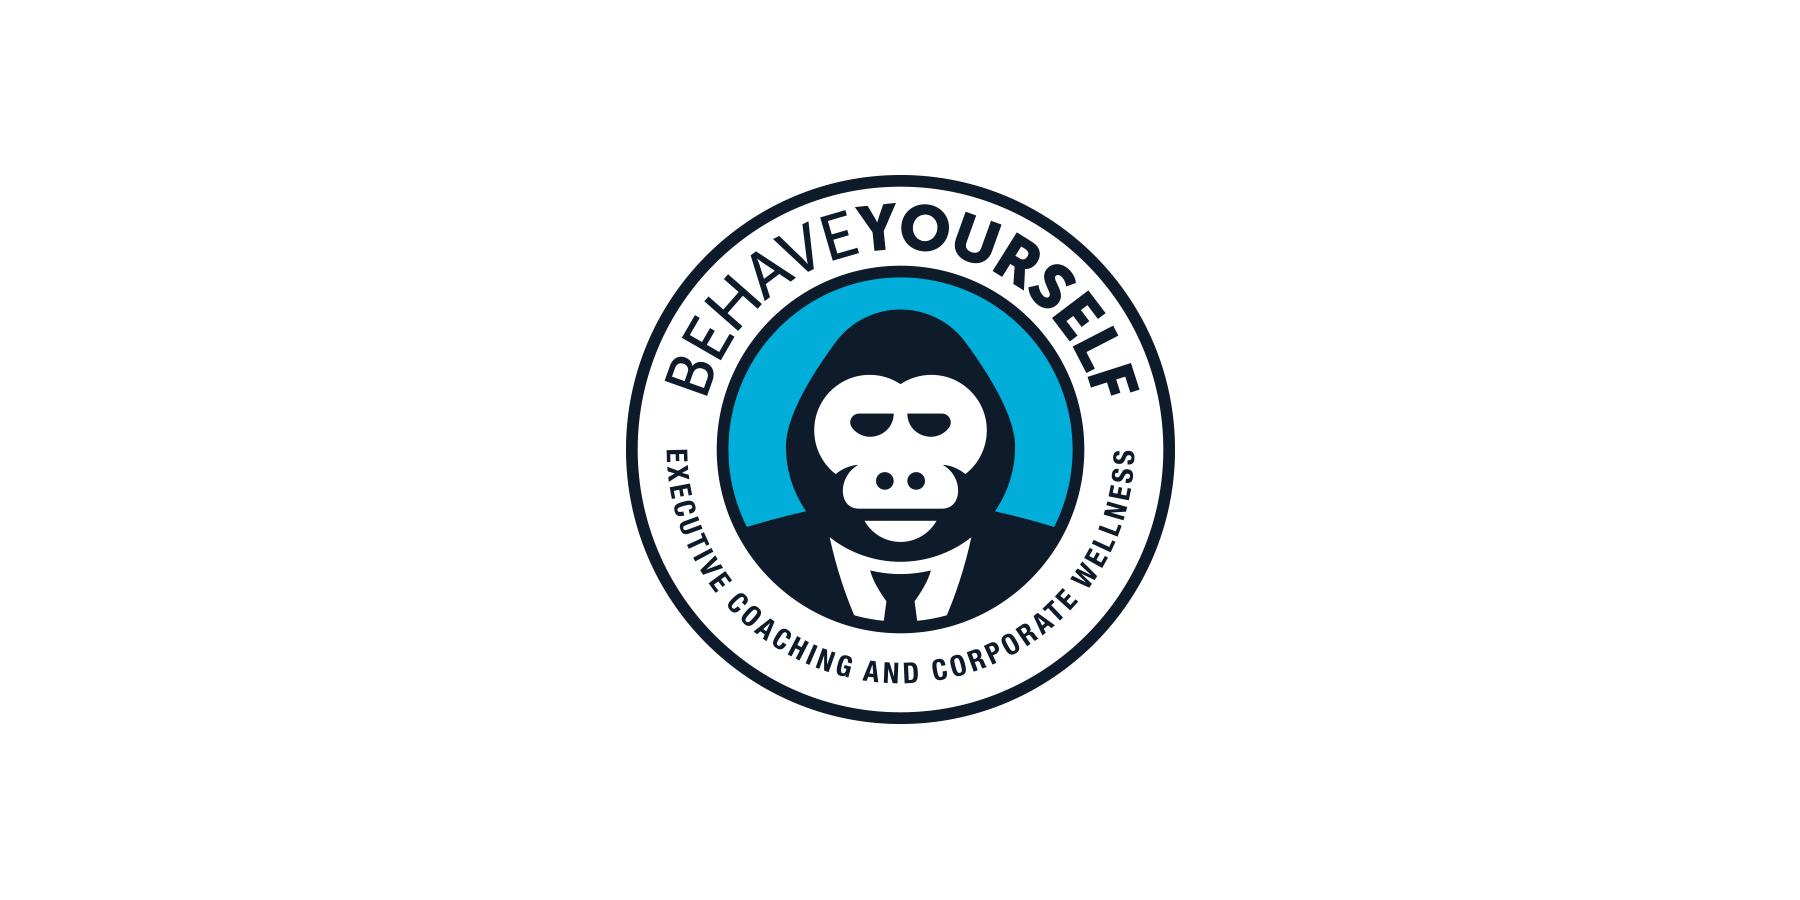 behave-yourself-logo-design-03